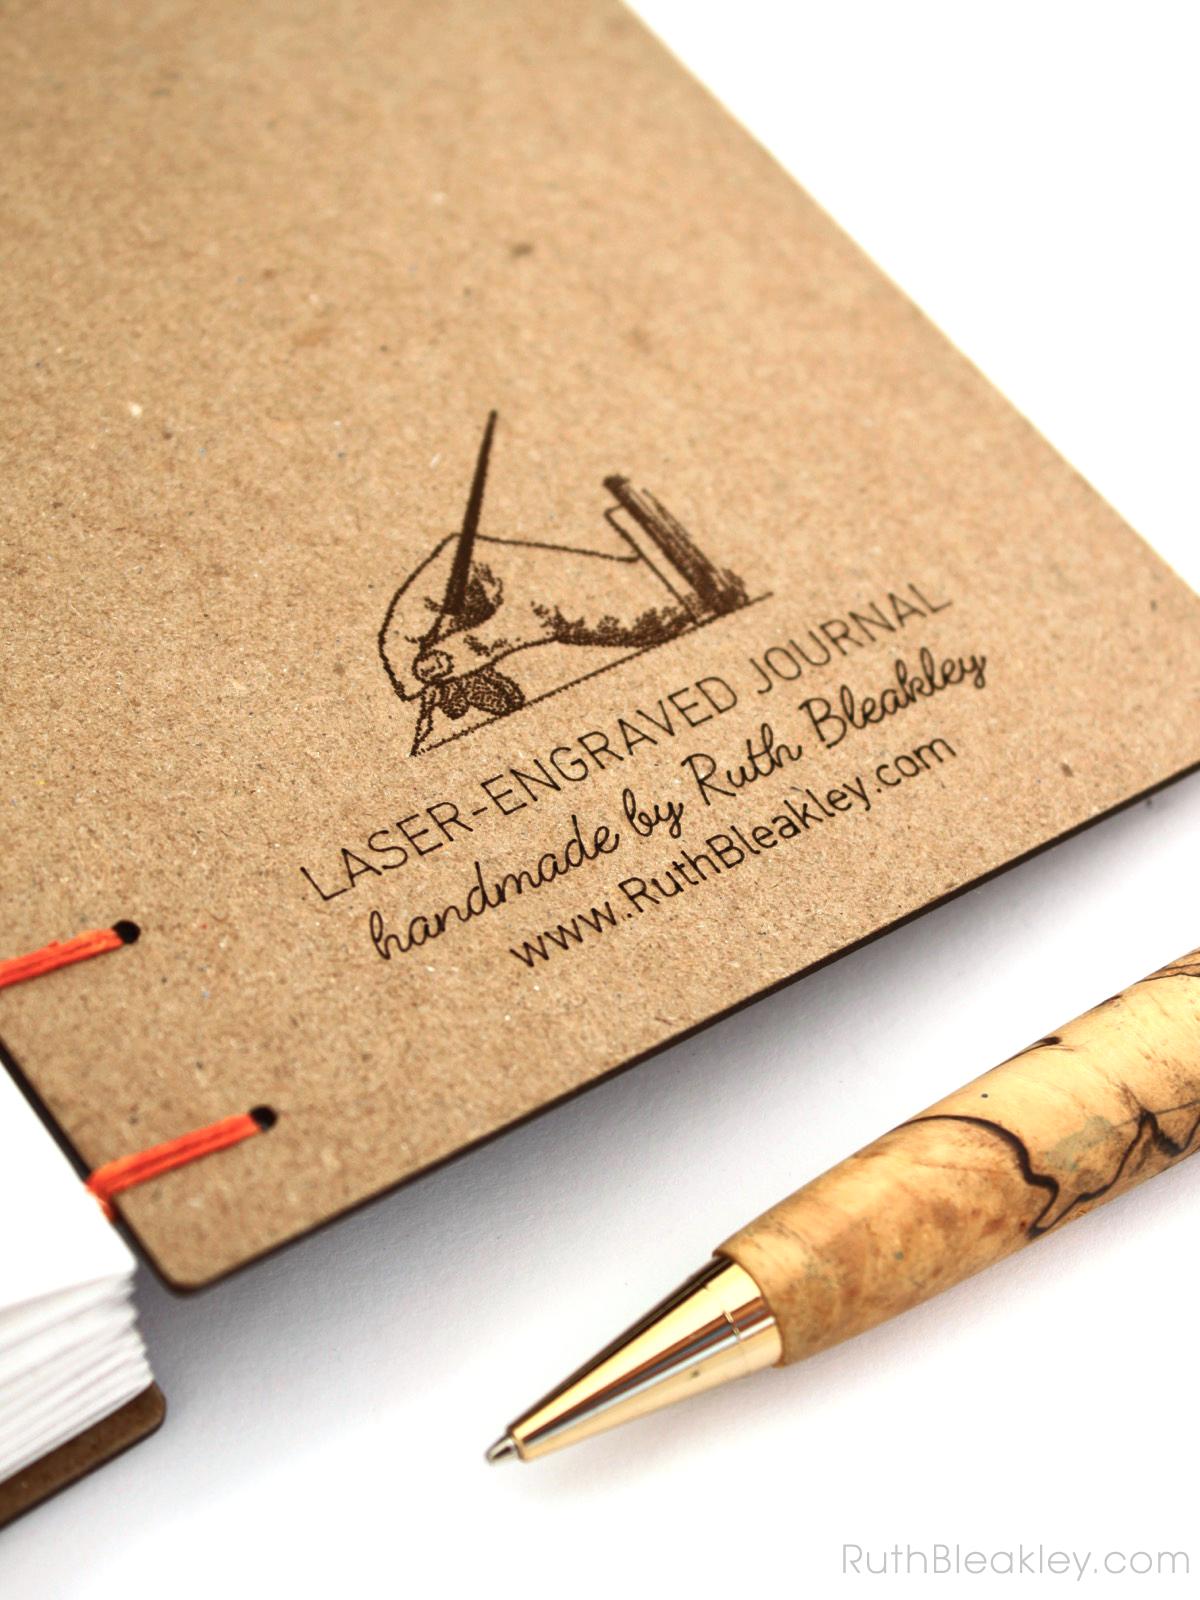 Bear Journal handmade by American book artist Ruth Bleakley - 8